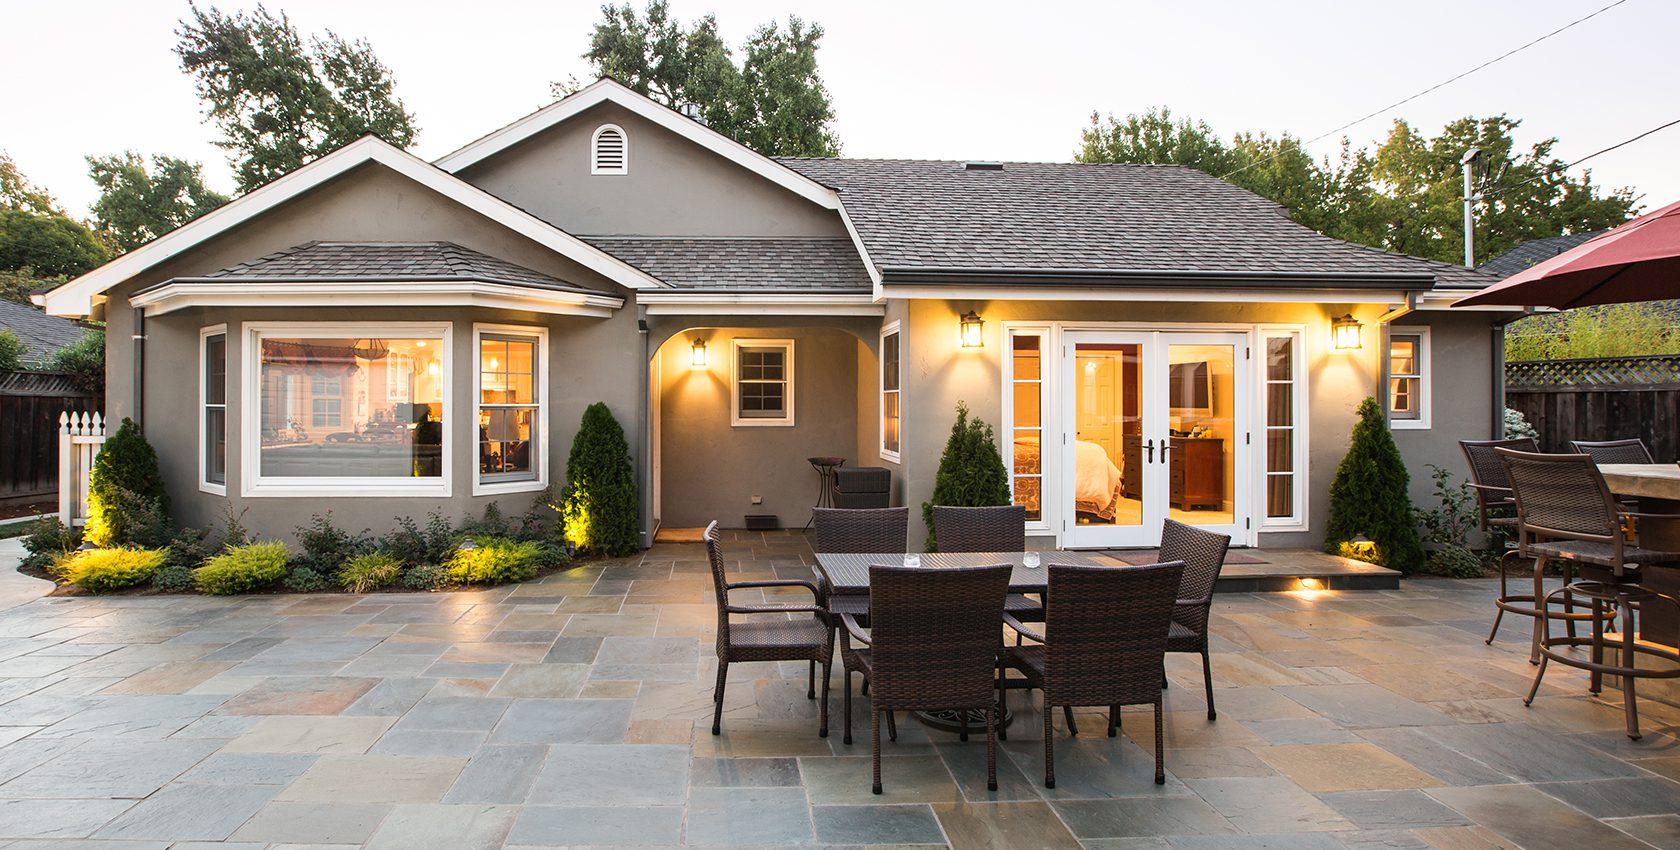 7 Exterior Renovation Ideas That Get Noticed Next Stage Design